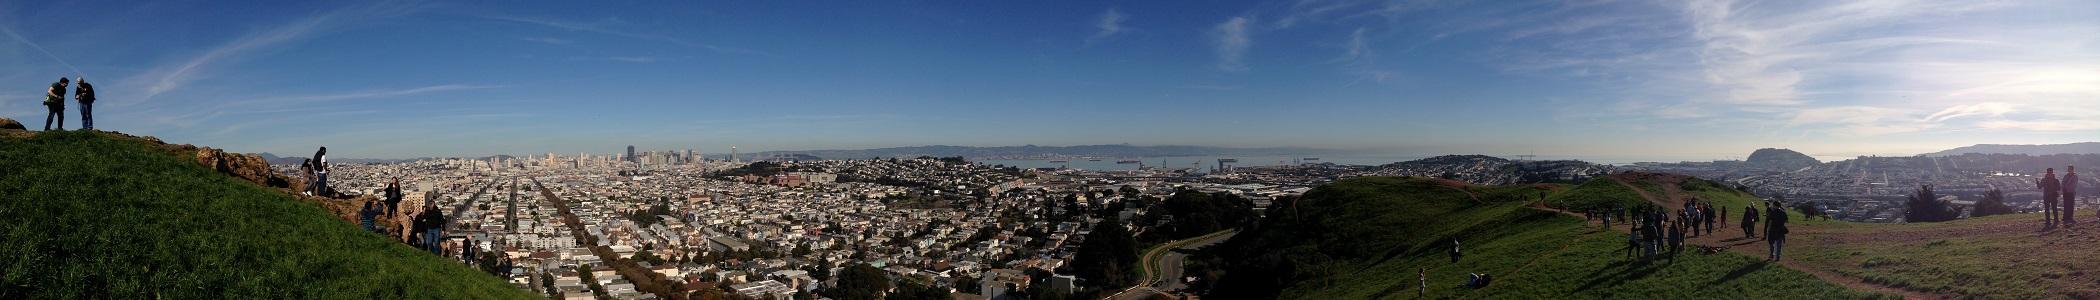 San Francisco/Bernal Heights – Travel guide at Wikivoyage